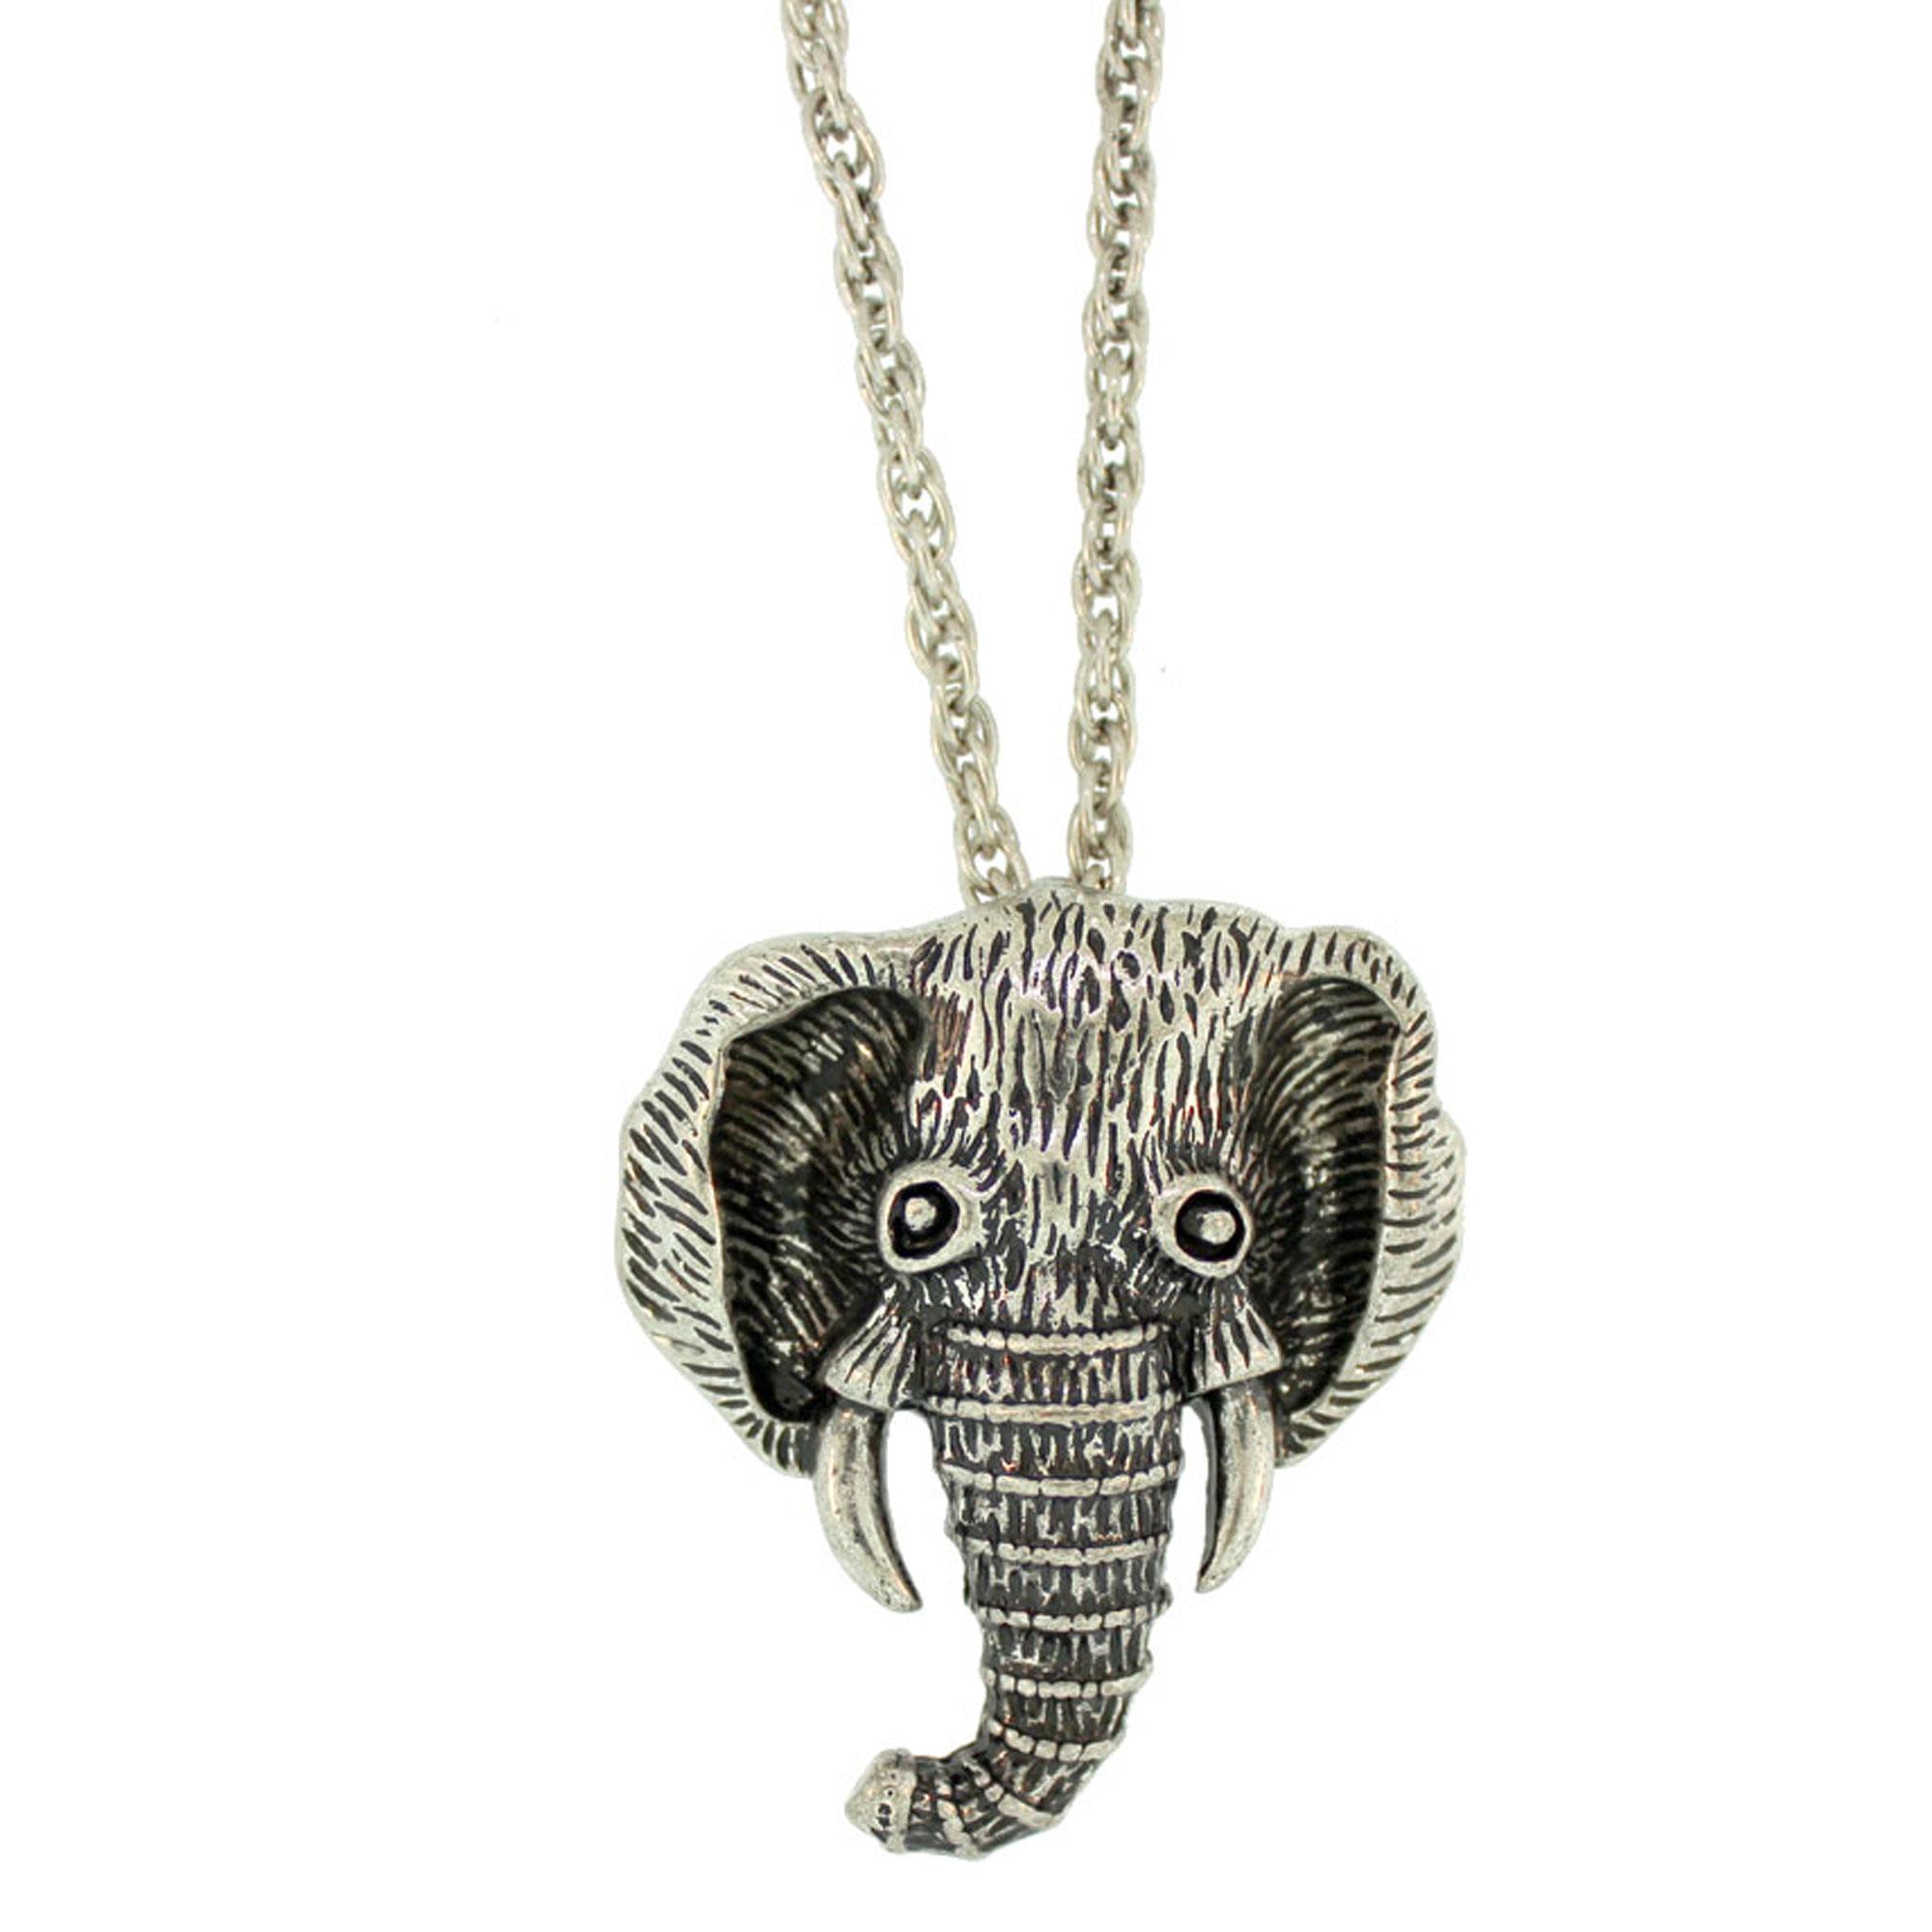 Burnished silver finish elephant head necklace igm elephant head pendant on a heavy chain jewelry aloadofball Images